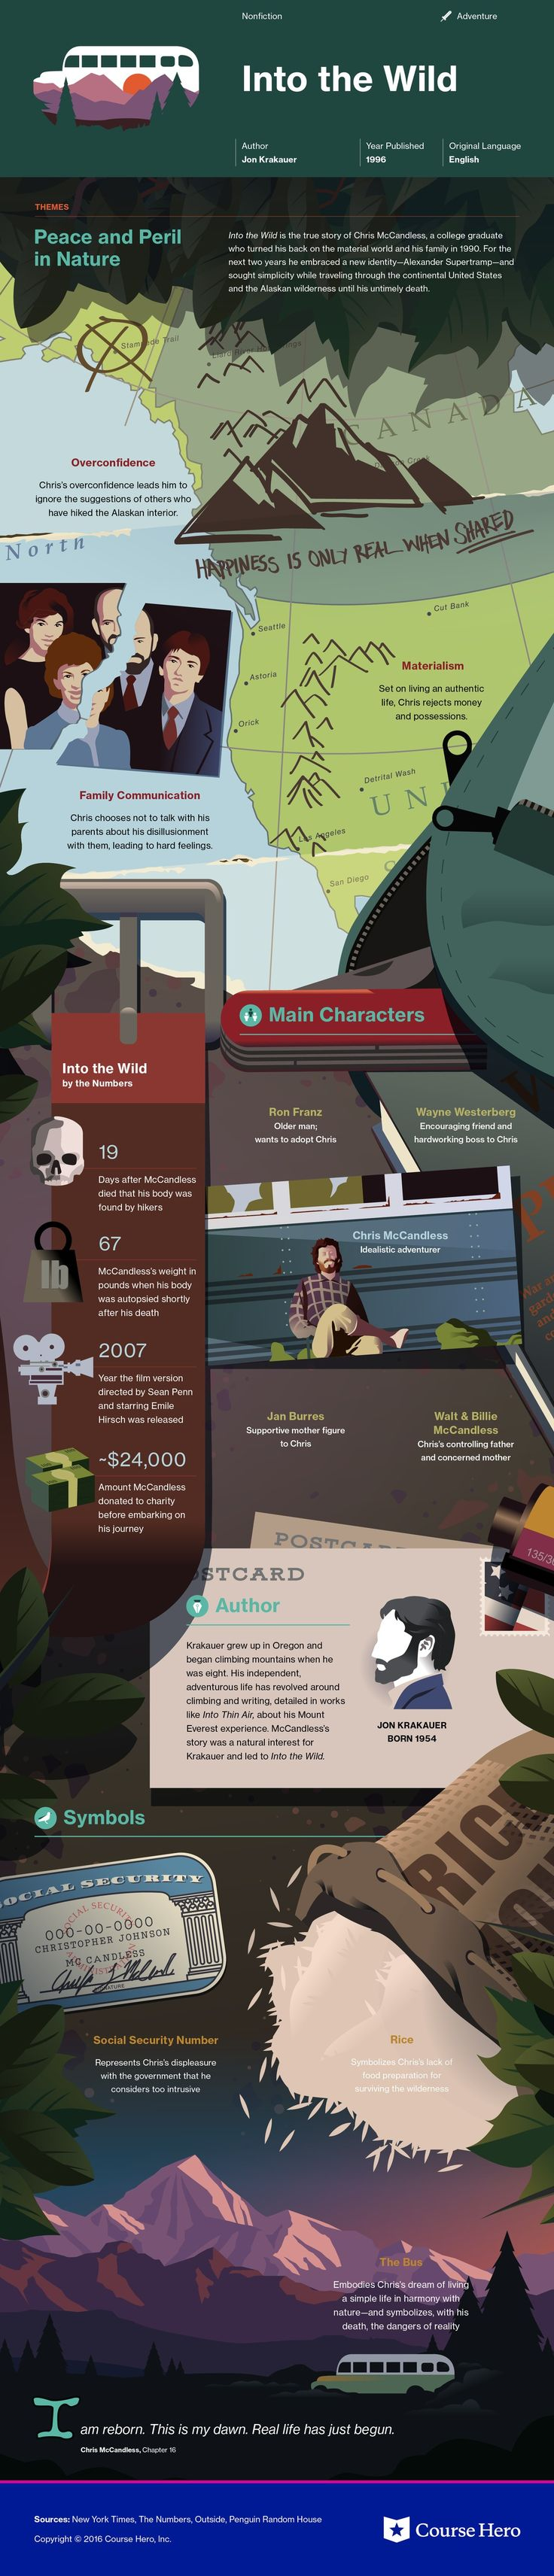 Into the Wild Infographic | Course Hero